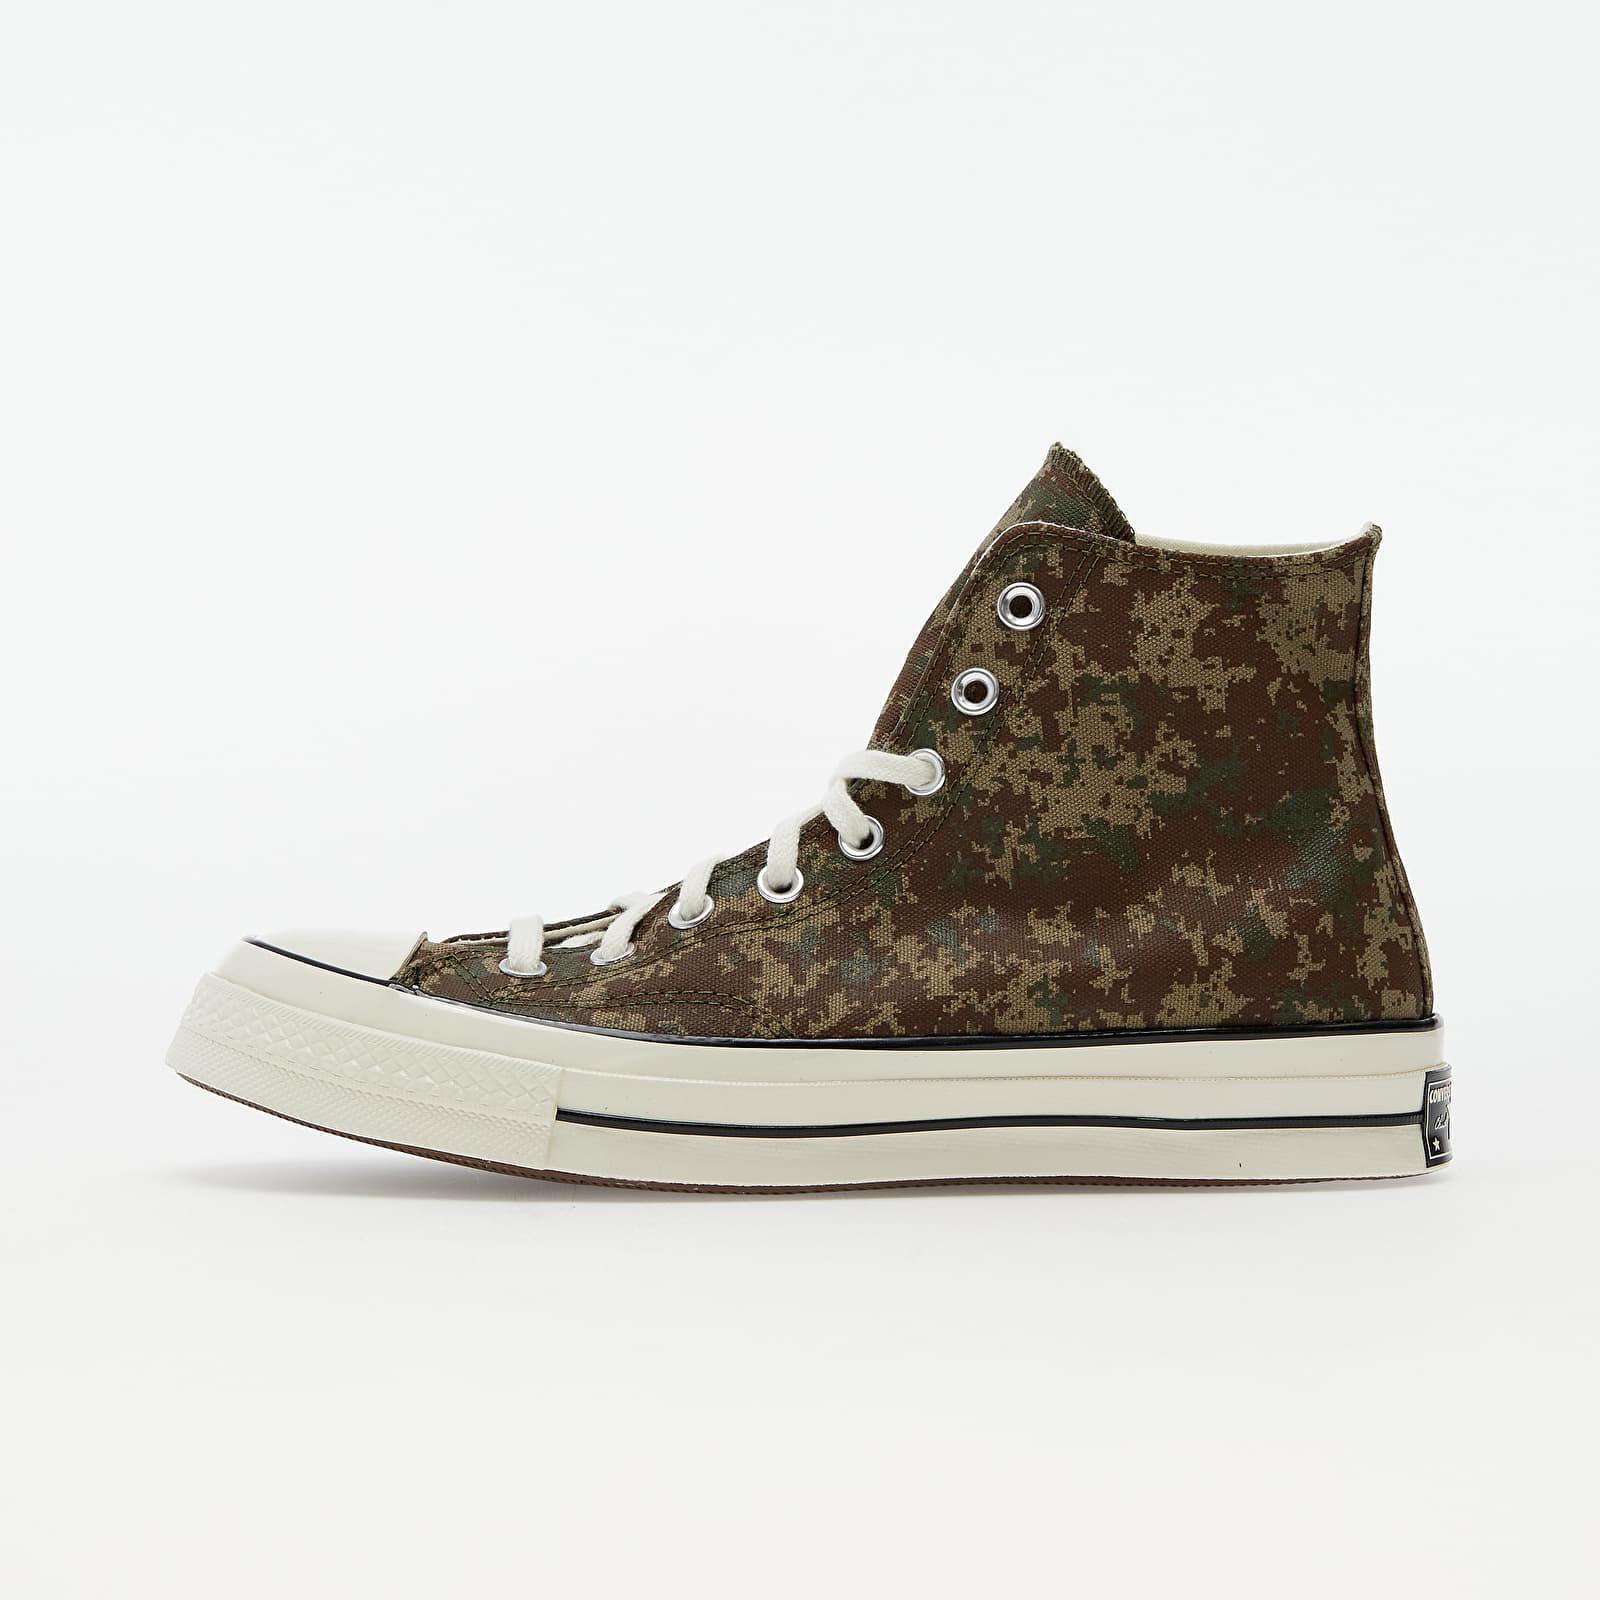 Converse Chuck 70 Sand/ Brown/ Herbal 170380C